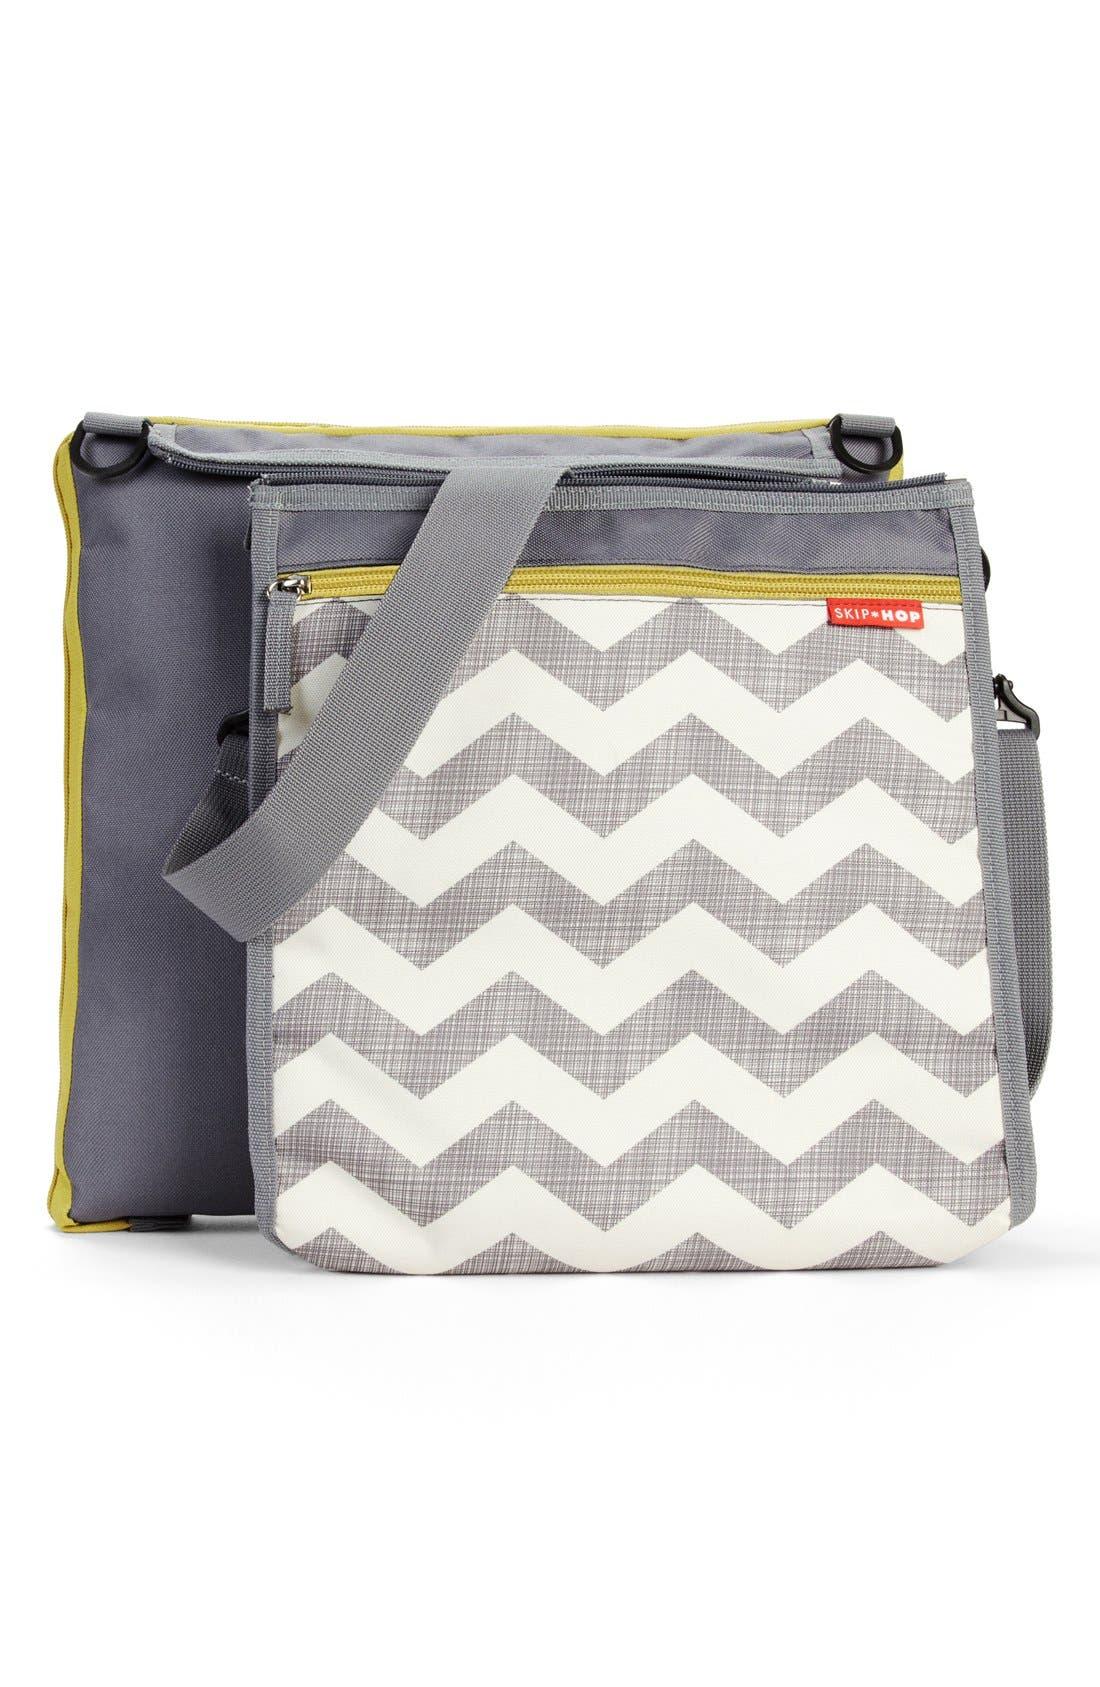 'Central Park' Outdoor Blanket & Cooler Bag,                             Main thumbnail 1, color,                             020